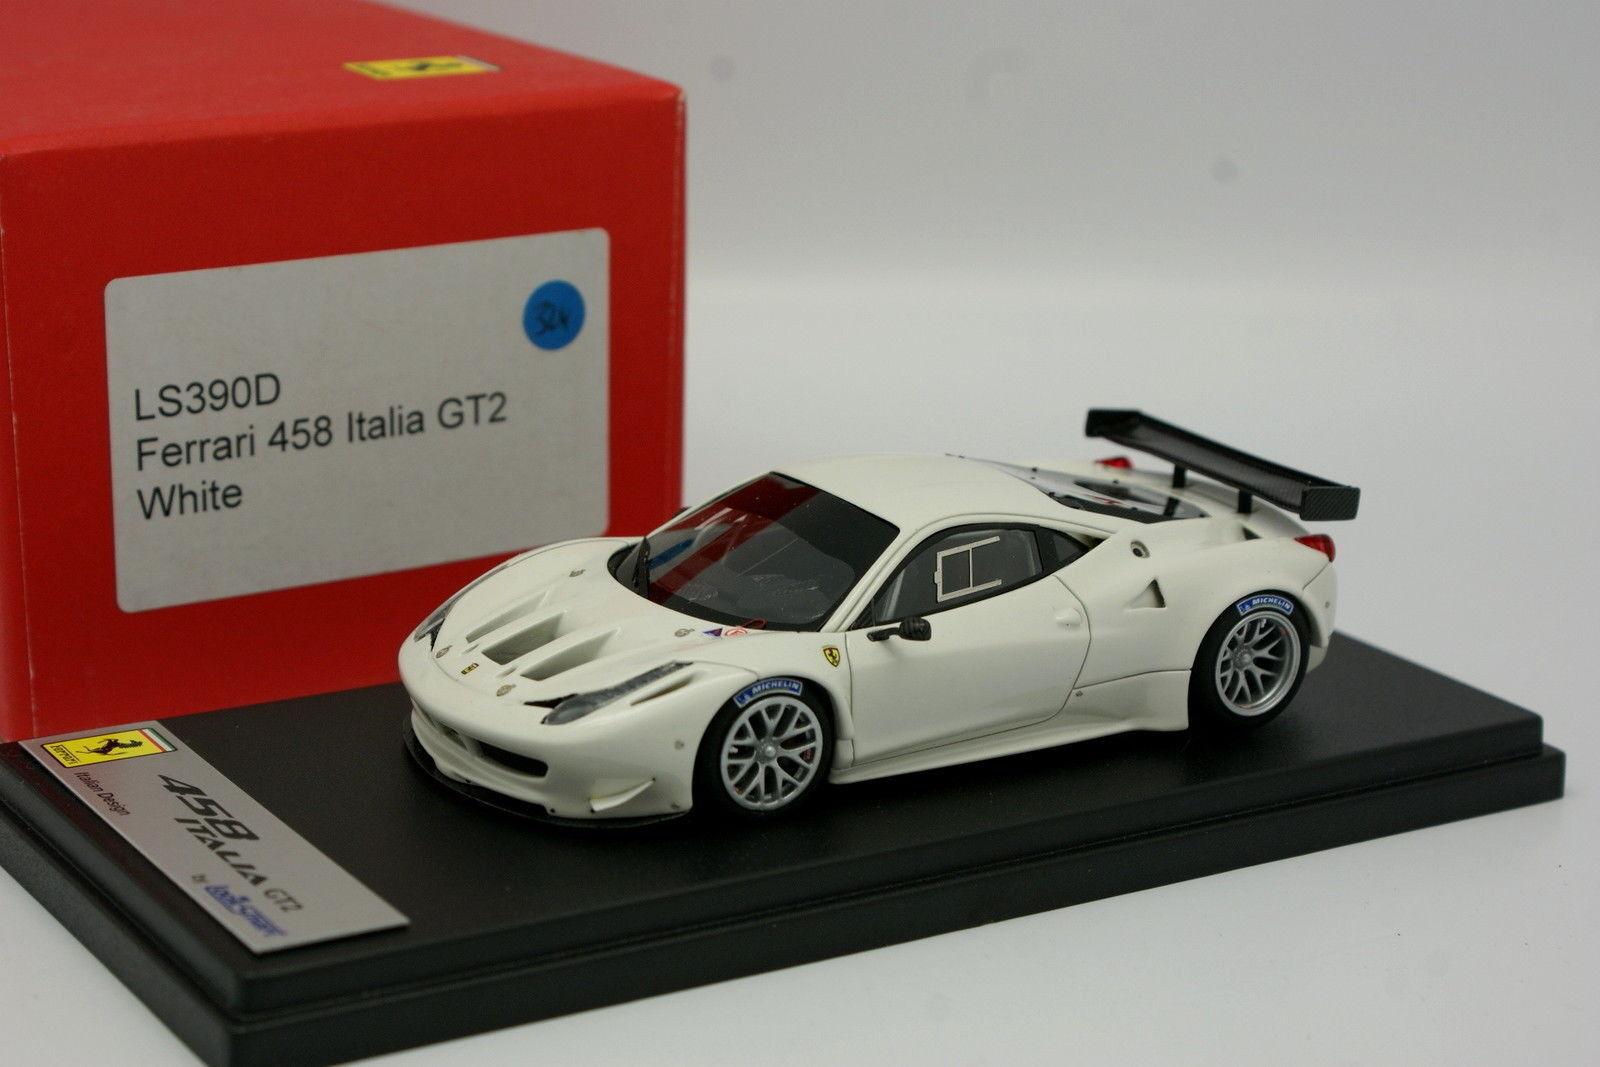 Lookintelligent 1 43 - Ferrari 458 Italia GT2  Blanche  en ligne au meilleur prix